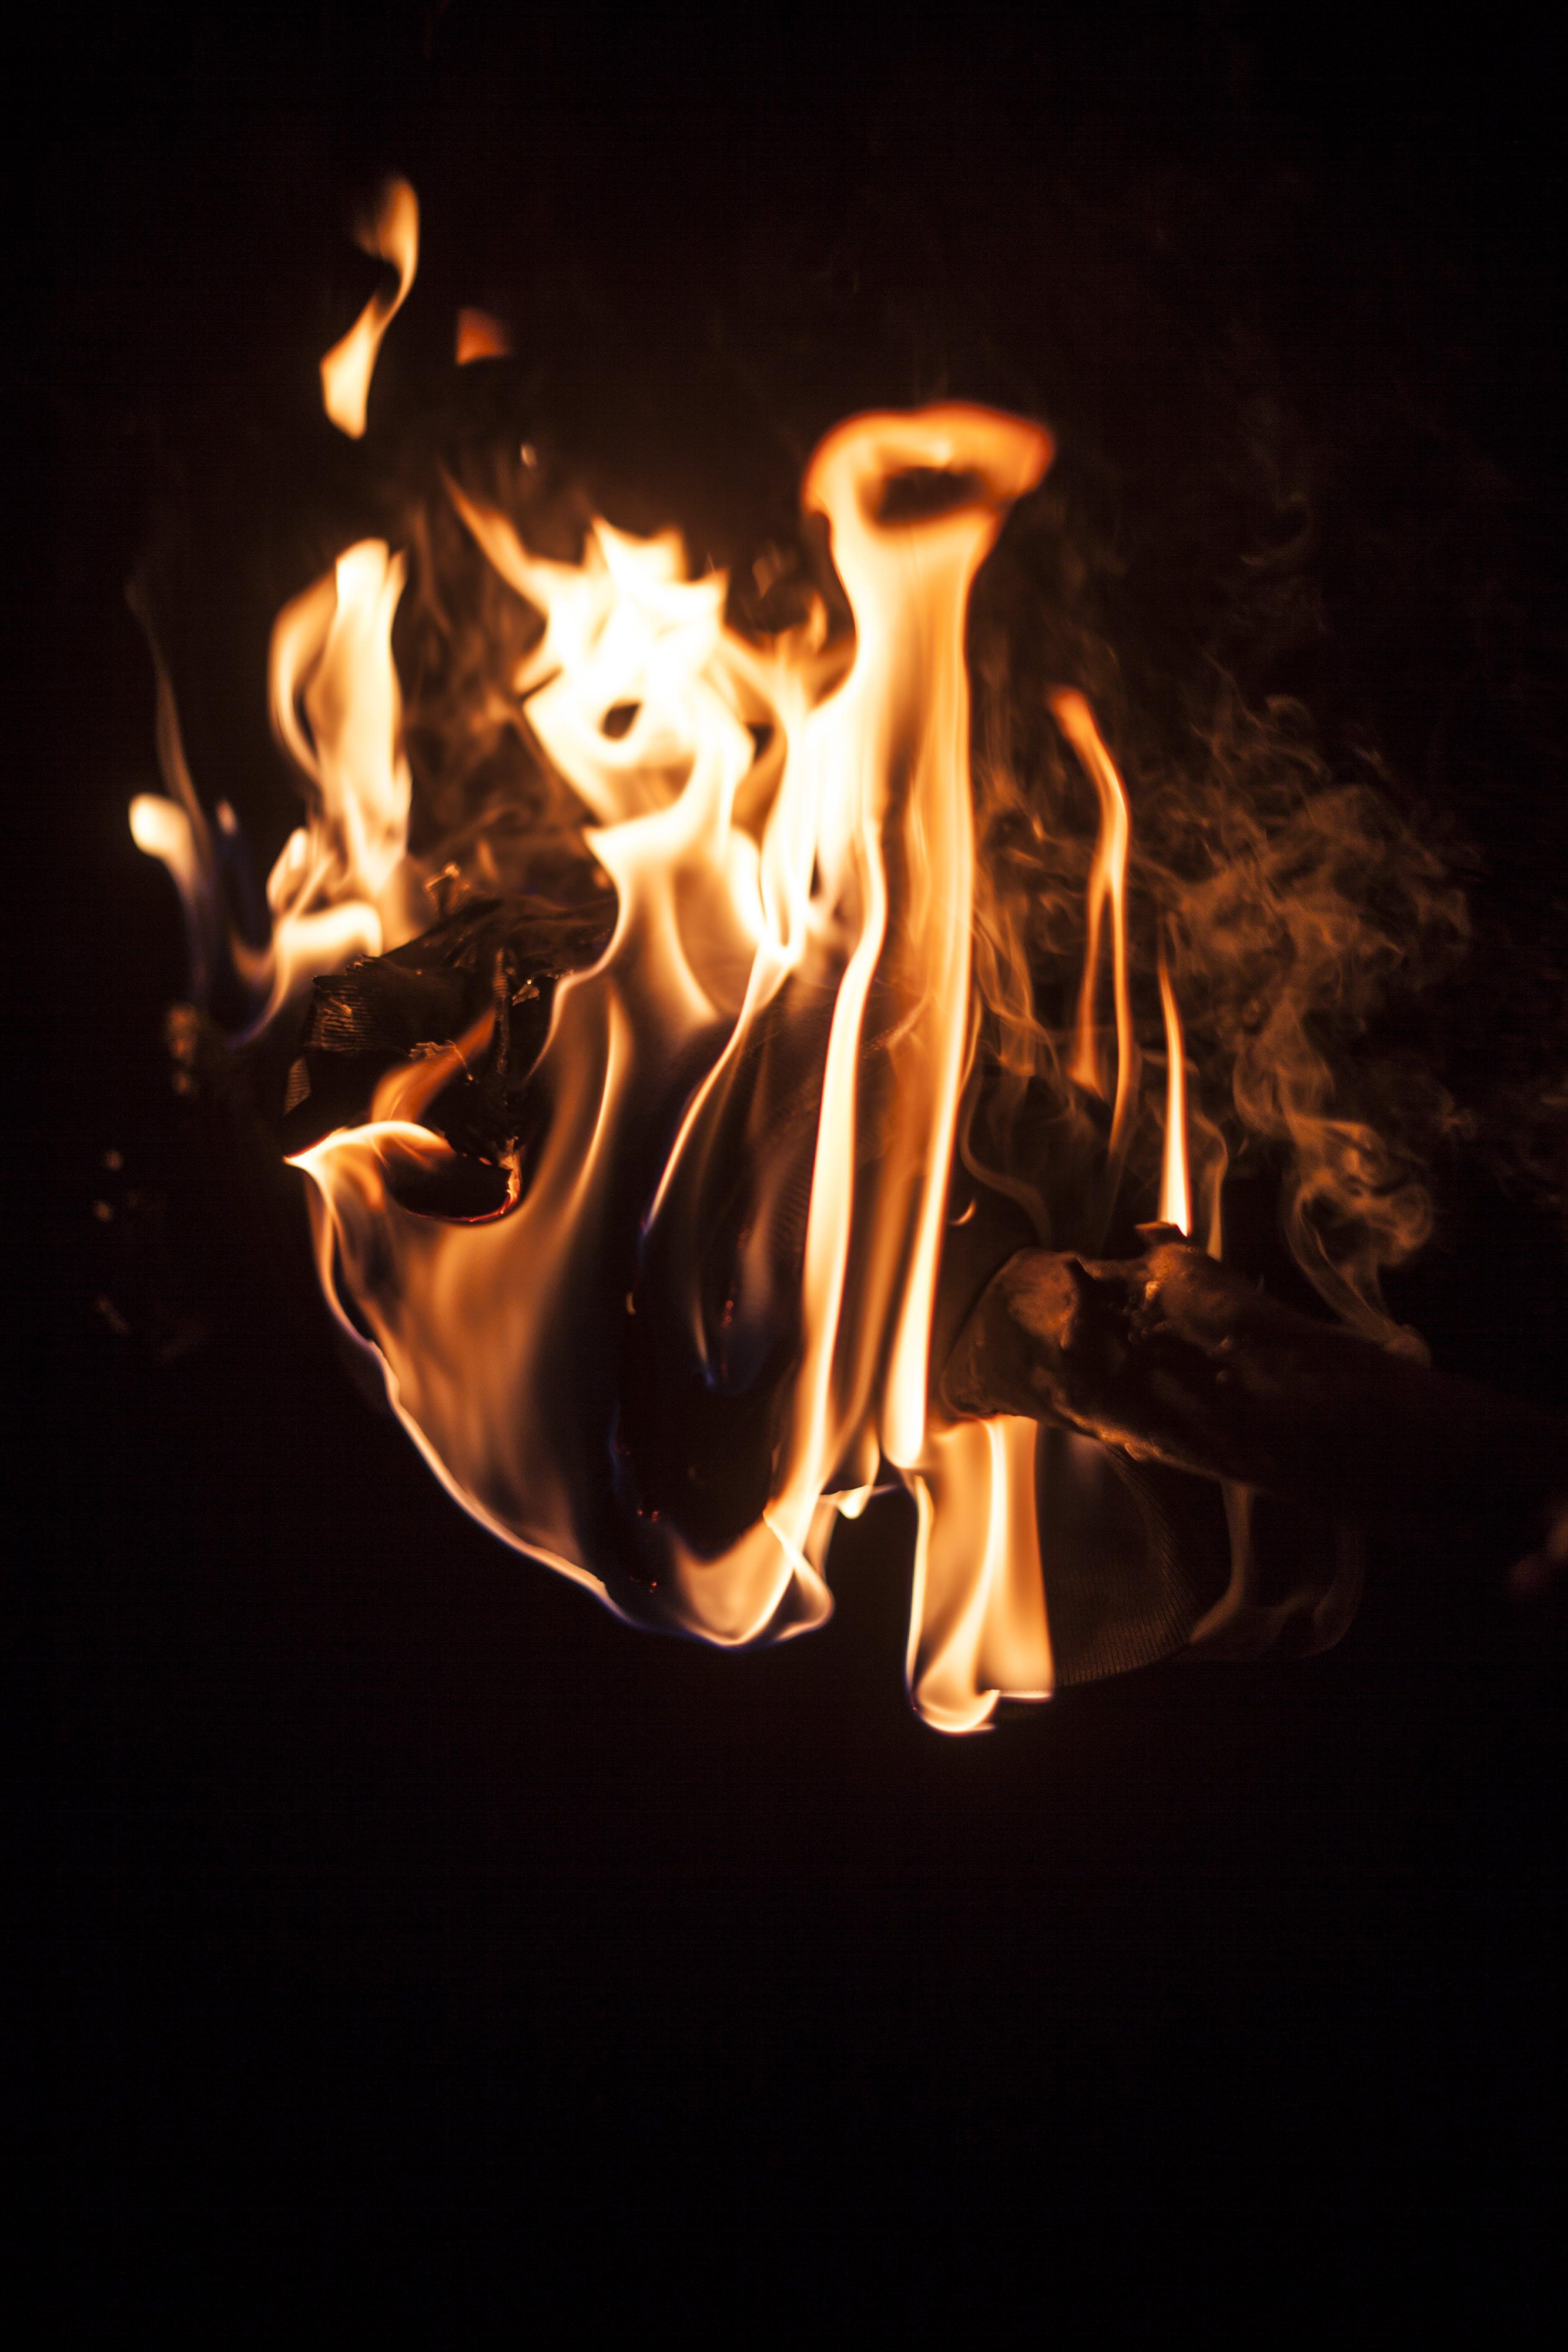 Close-up Photography Of Bonfire